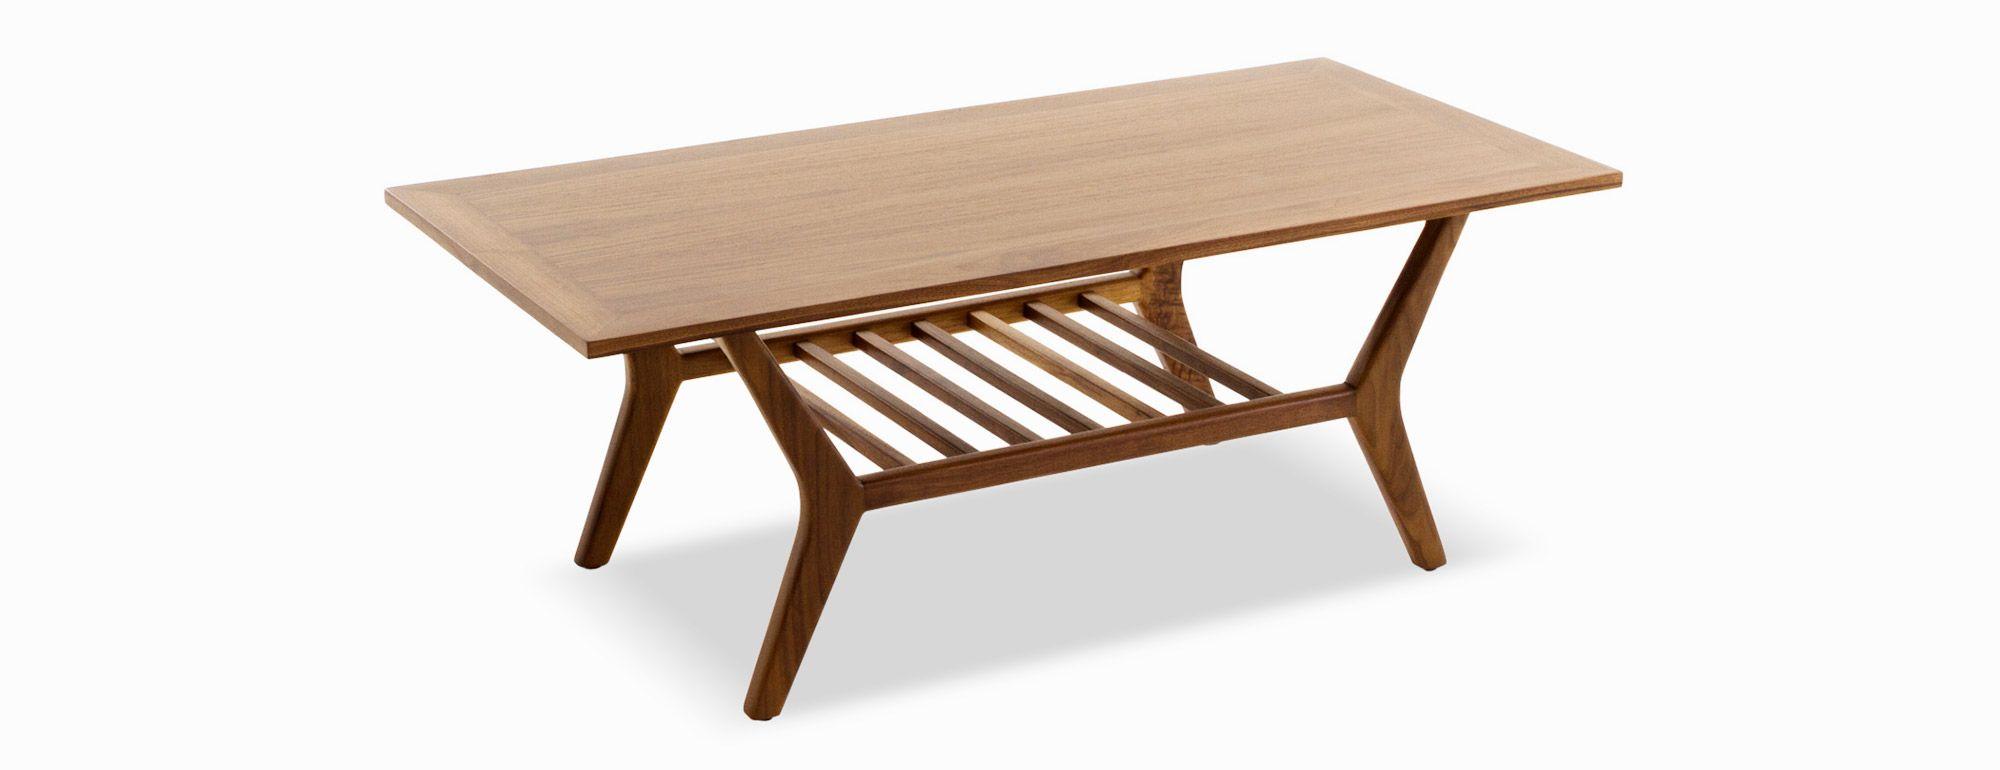 Versatile and ohsoretro, this doubledecker coffee table